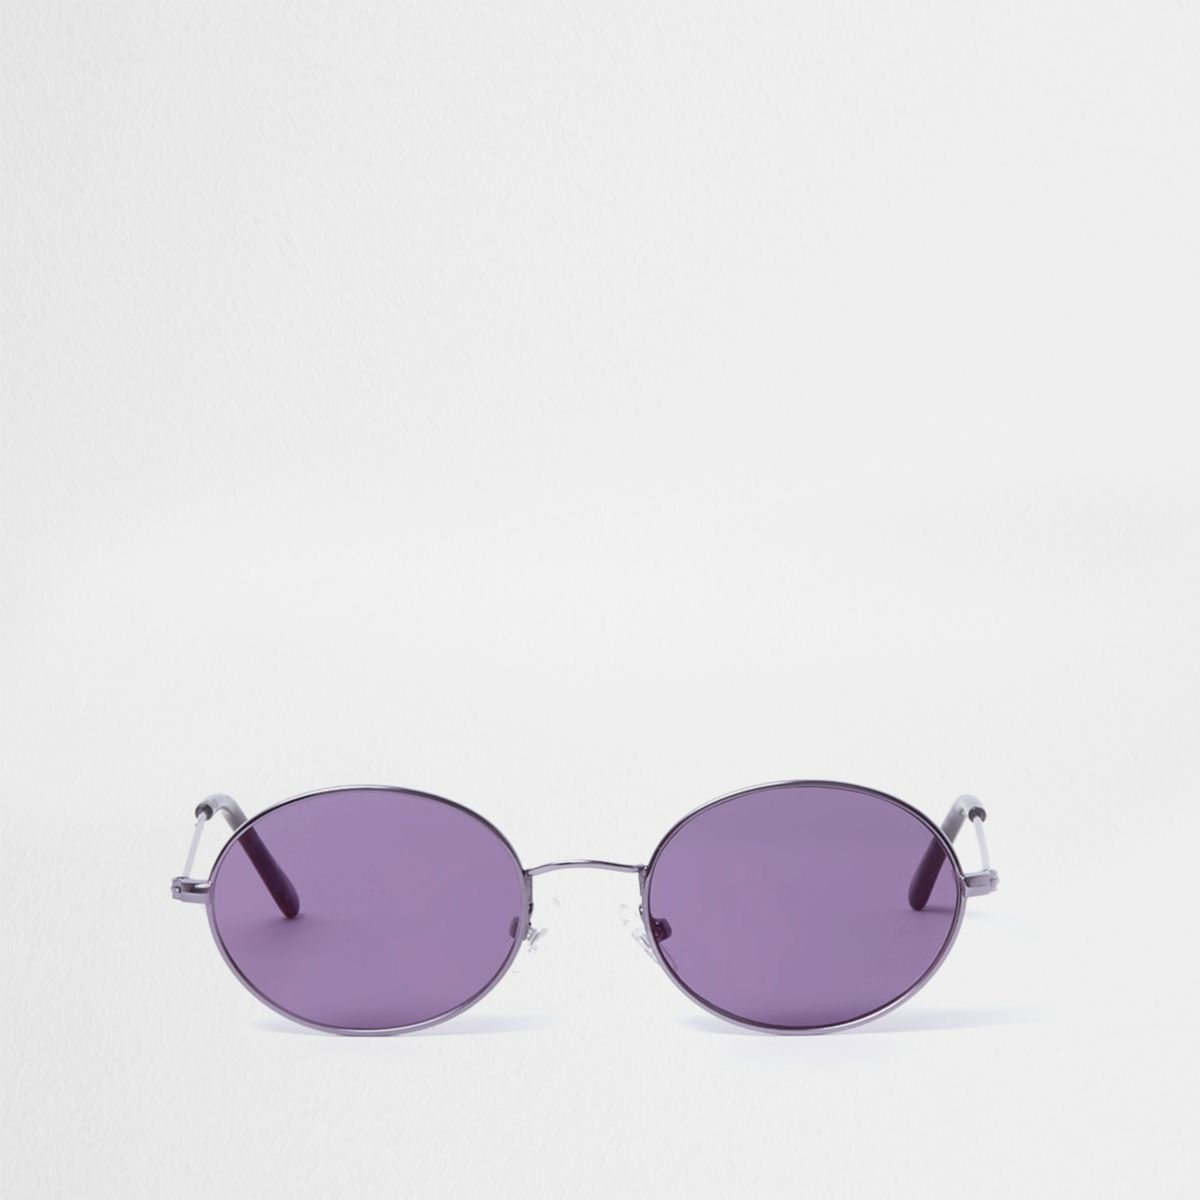 Girls purple tinted oval retro sunglasses